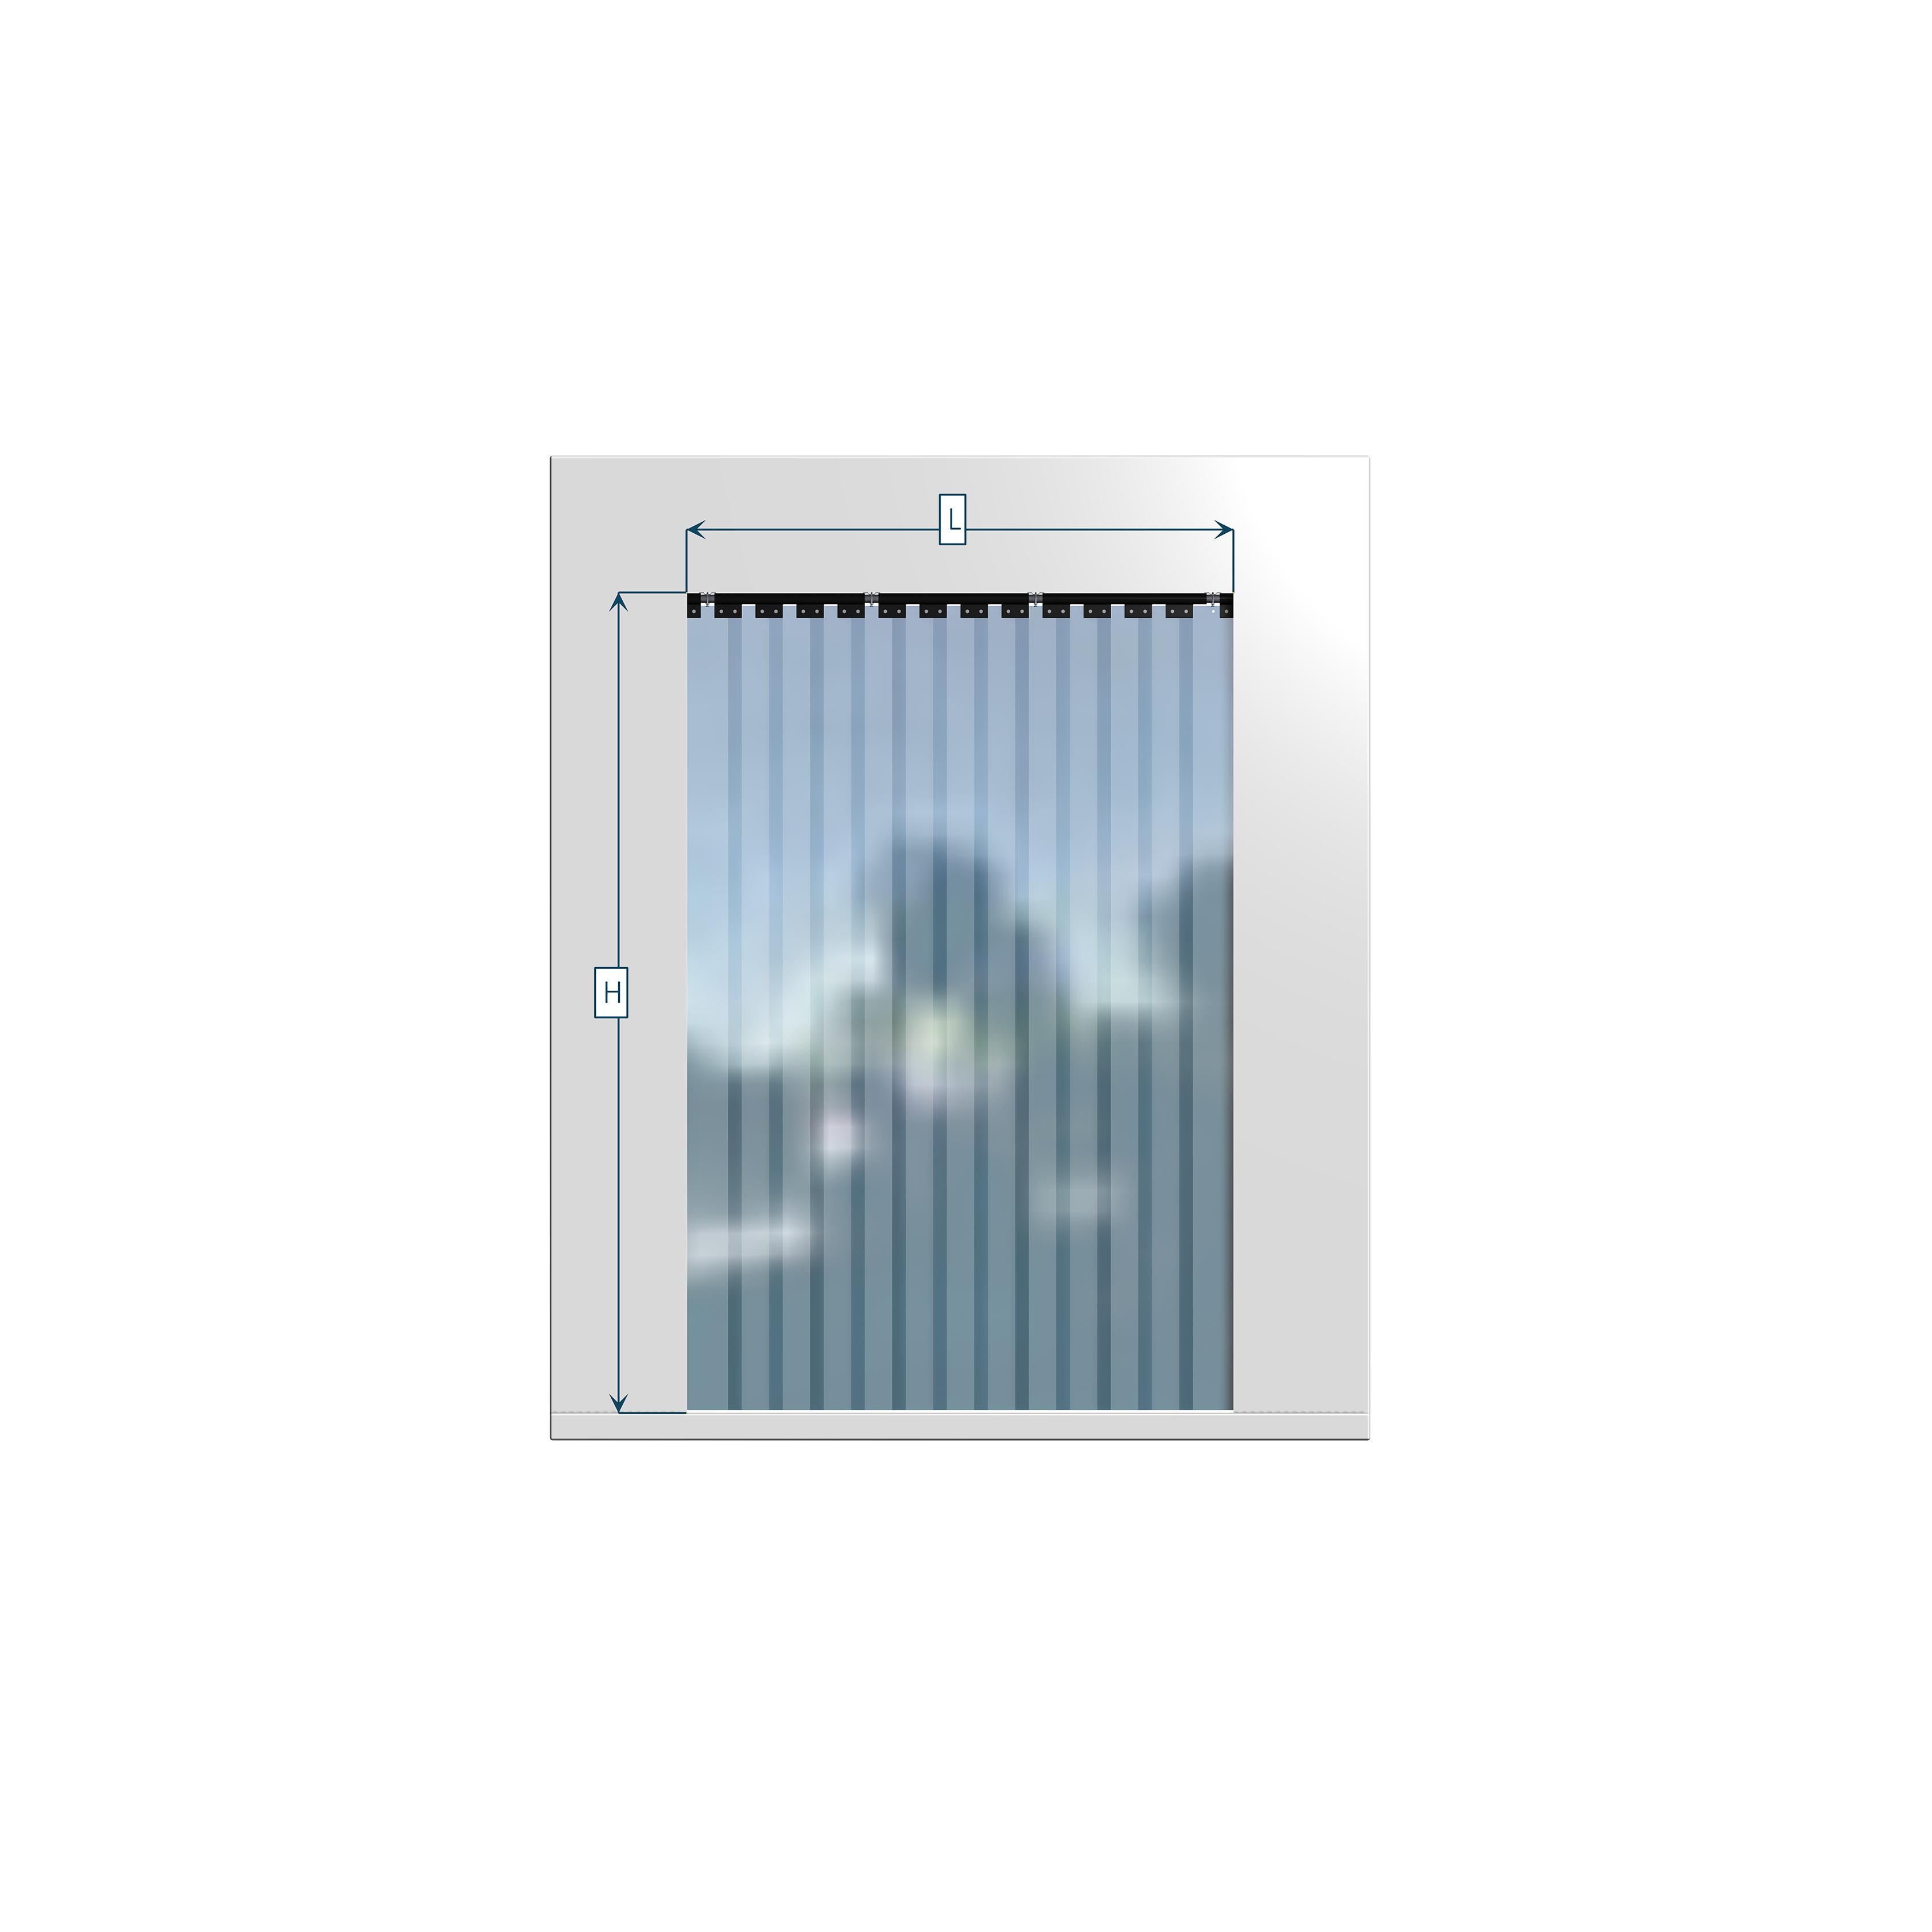 Tende a strisce bandelle in pvc 200x2 interno vano for Tende a strisce in pvc